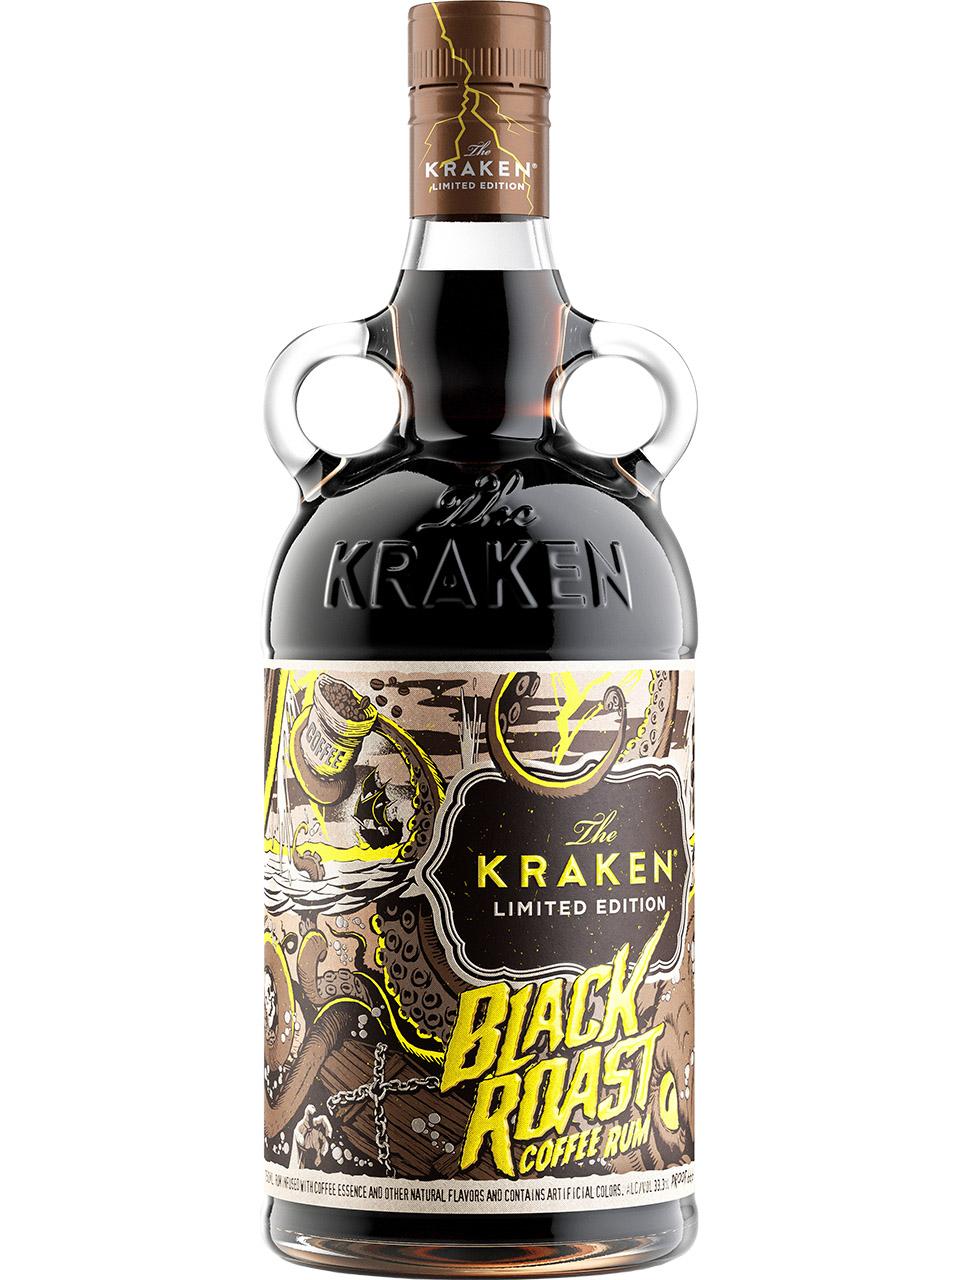 The Kraken Black Roast Coffee